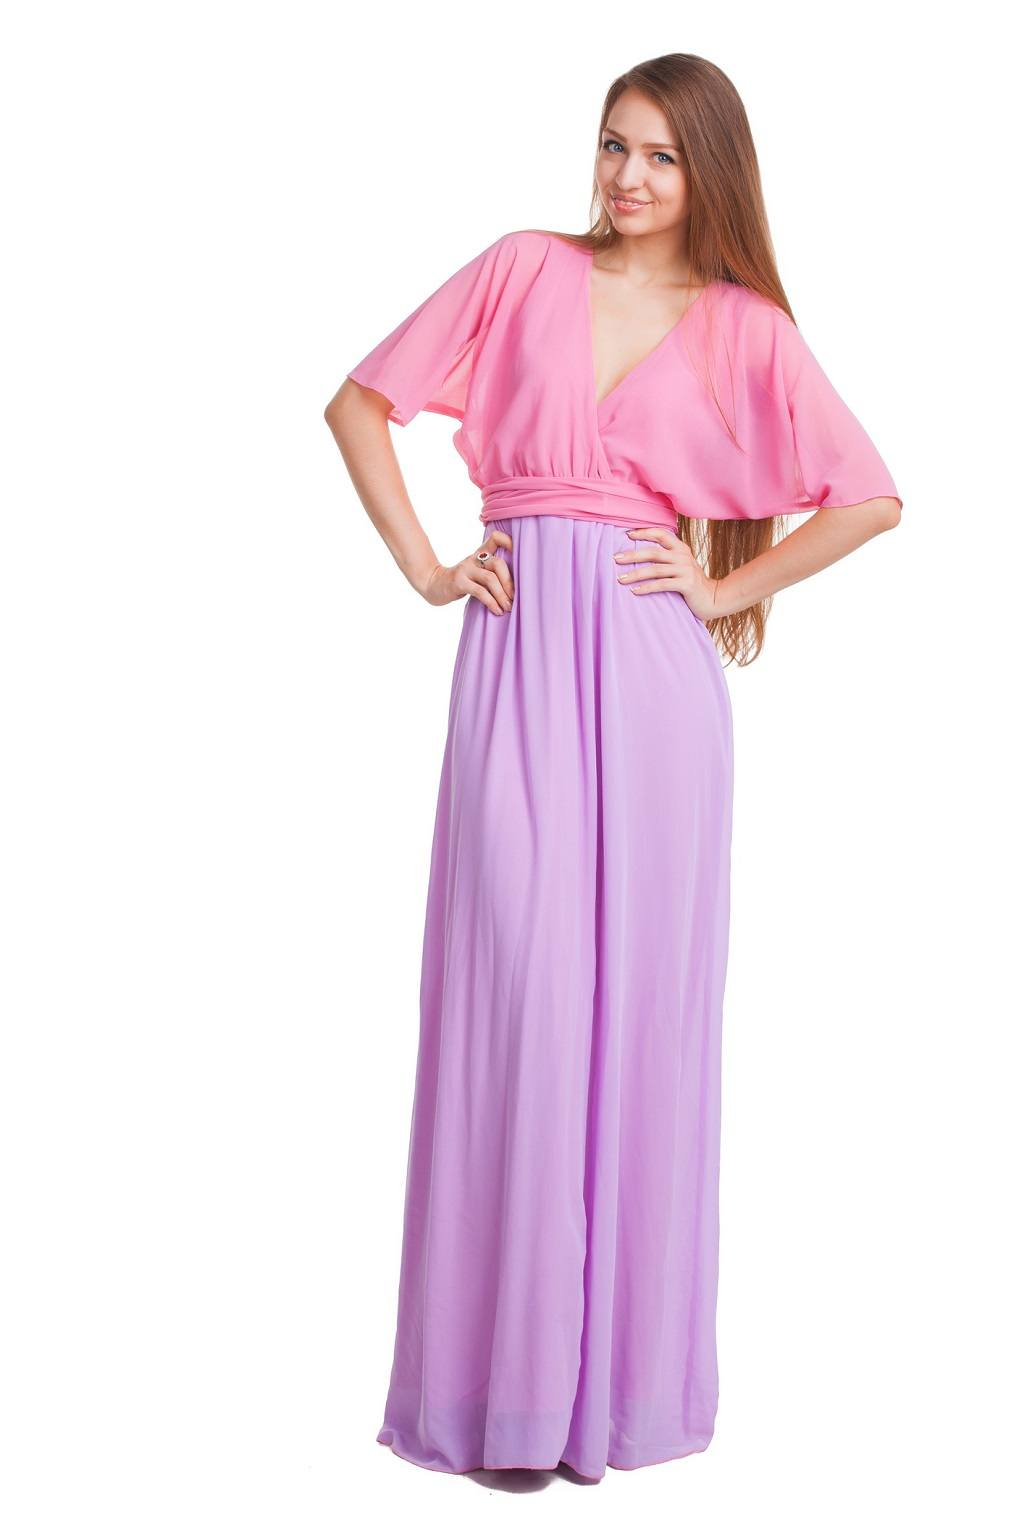 woman posing in long dress